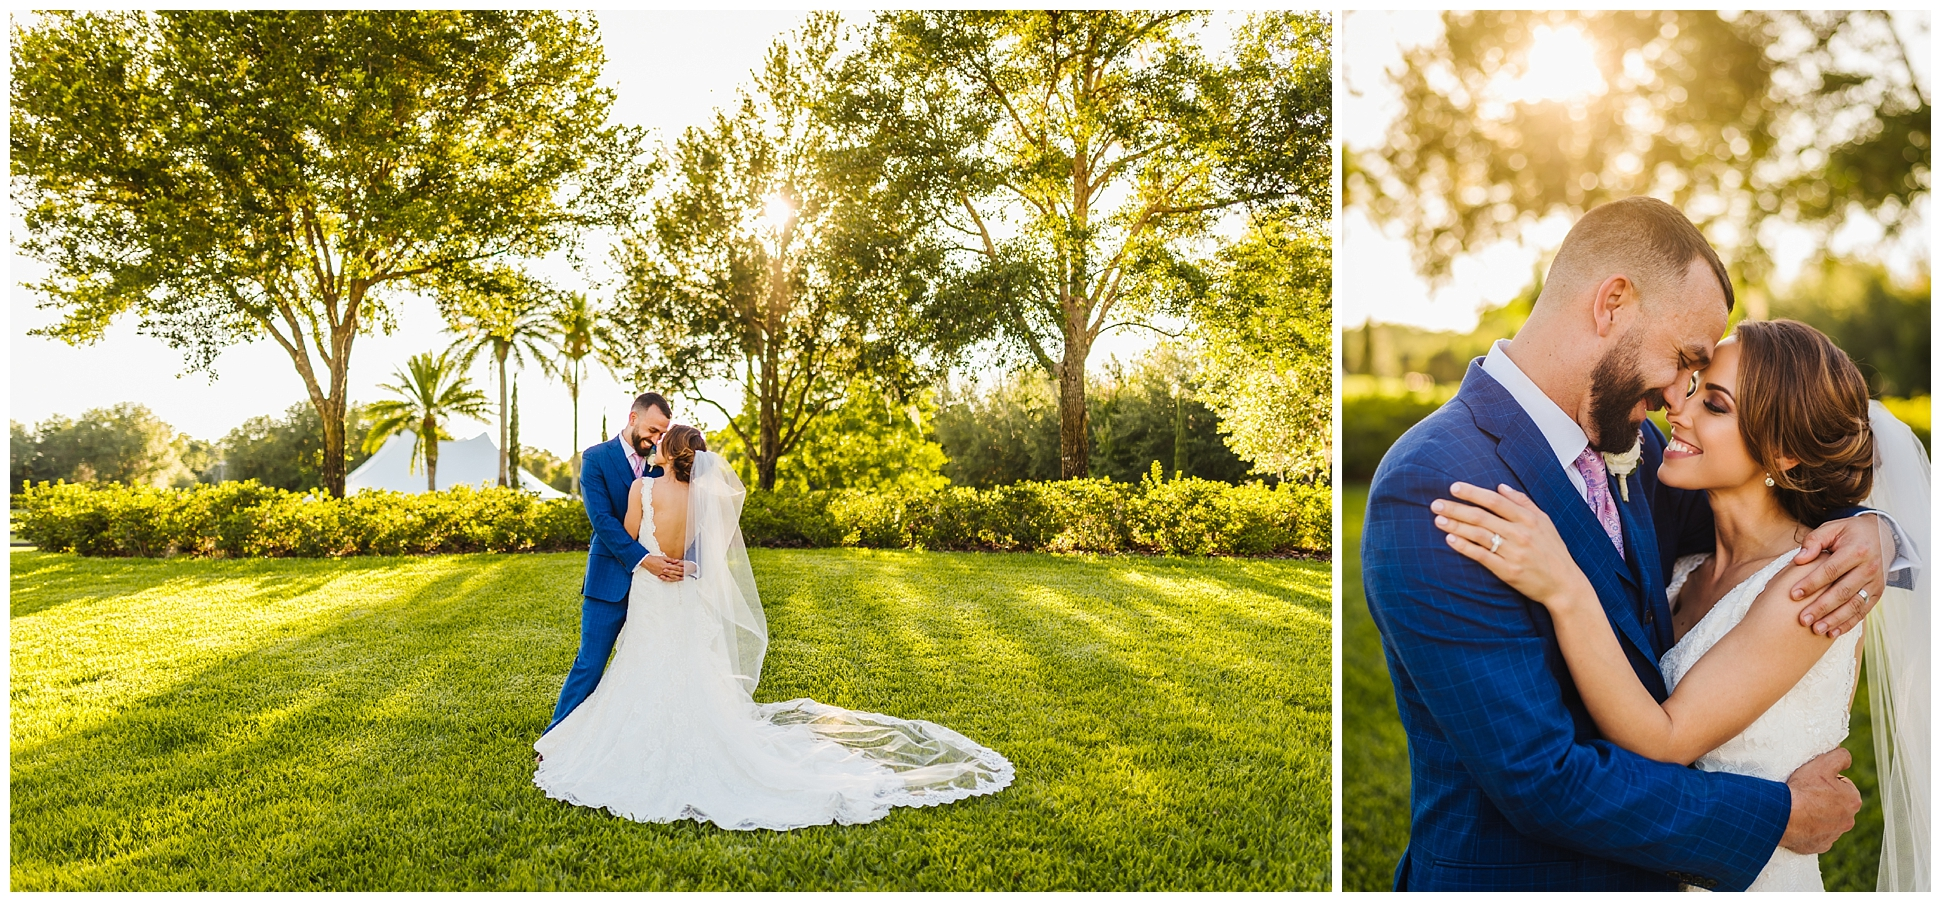 Tampa-luxury-wedding-photographer-mision-lago-private-estate_0041.jpg